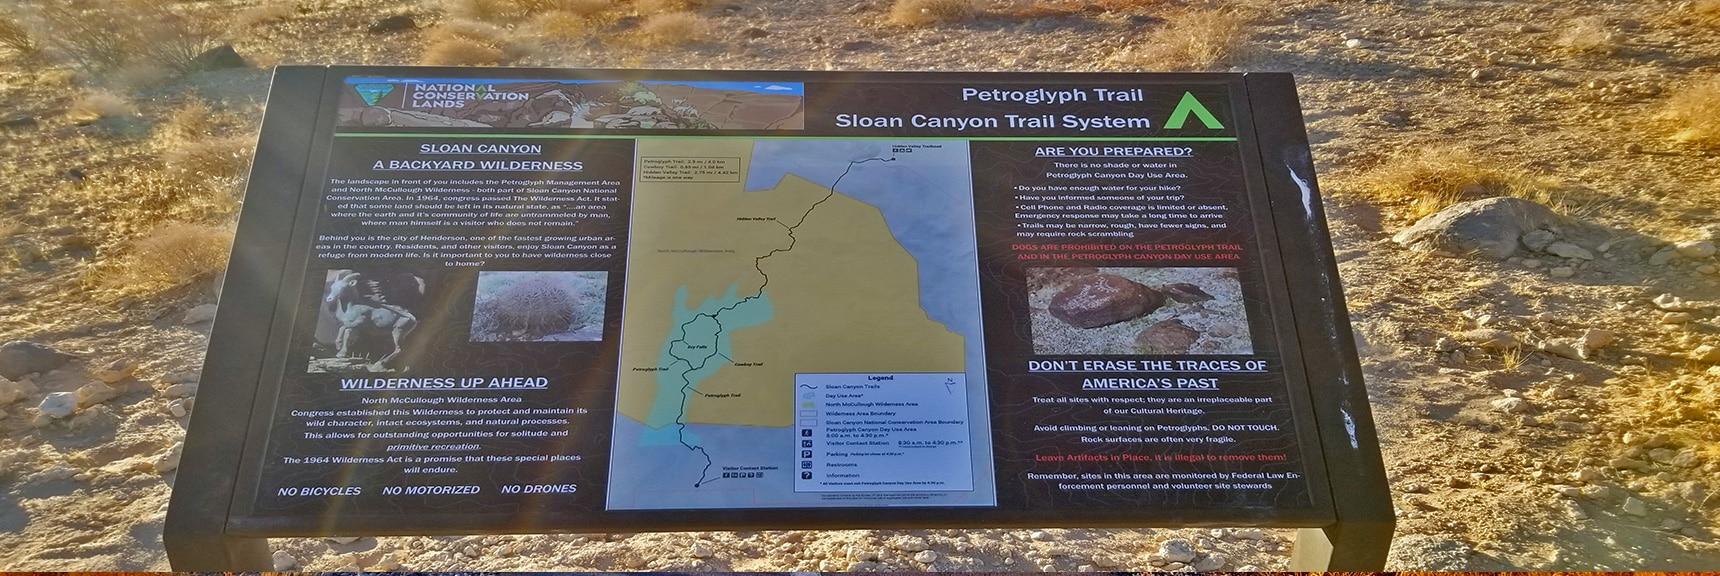 Interpretive Sign at Petroglyph Canyon Trailhead | Petroglyph Canyon | Sloan Canyon National Conservation Area, Nevada